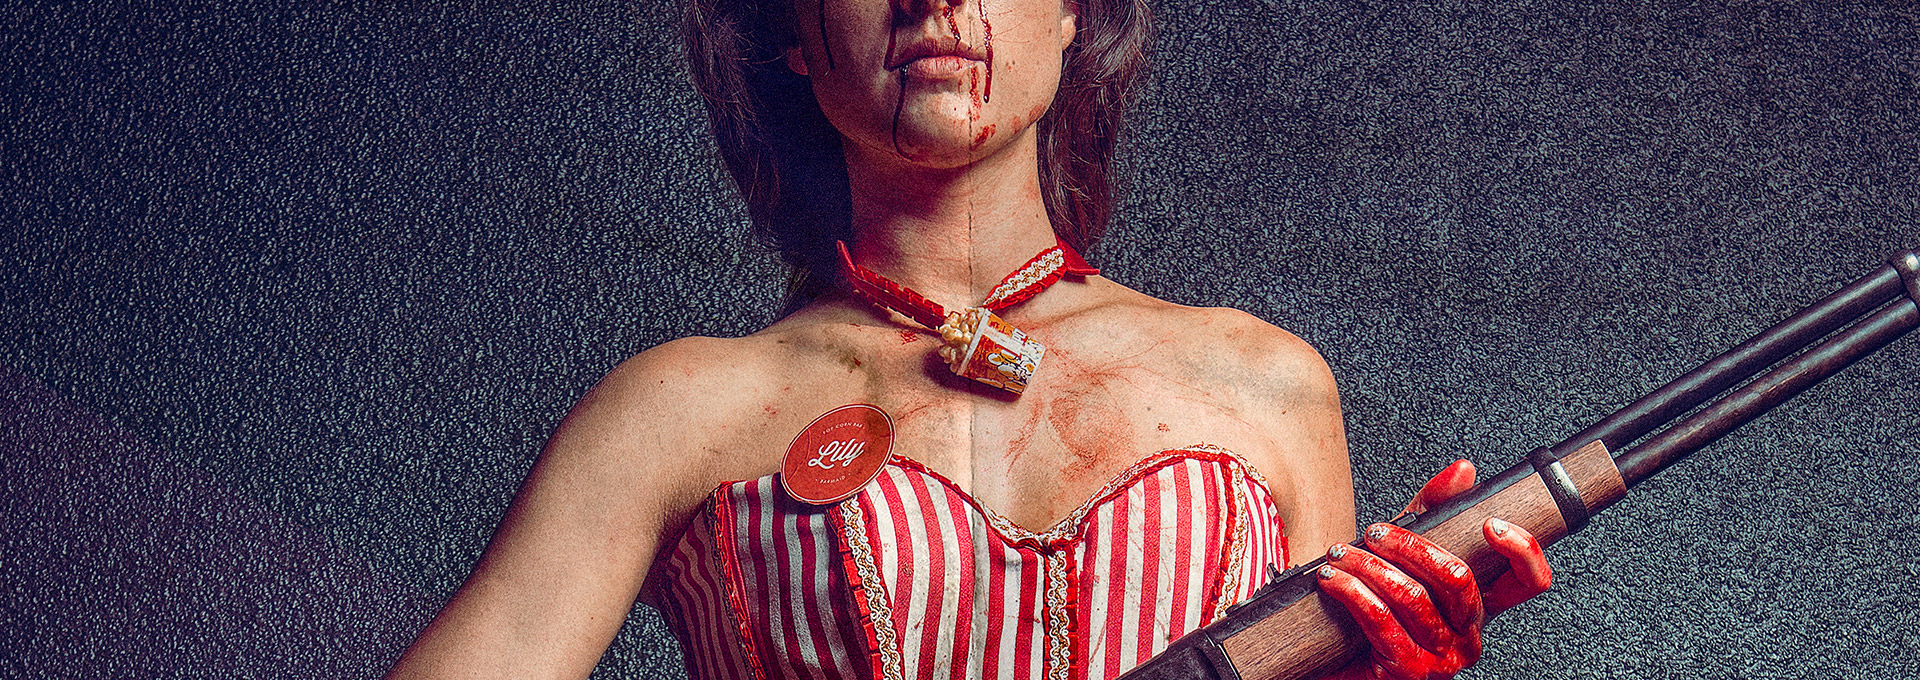 Bitch, Popcorn & Blood with Lise Gardo by Fabio Soares